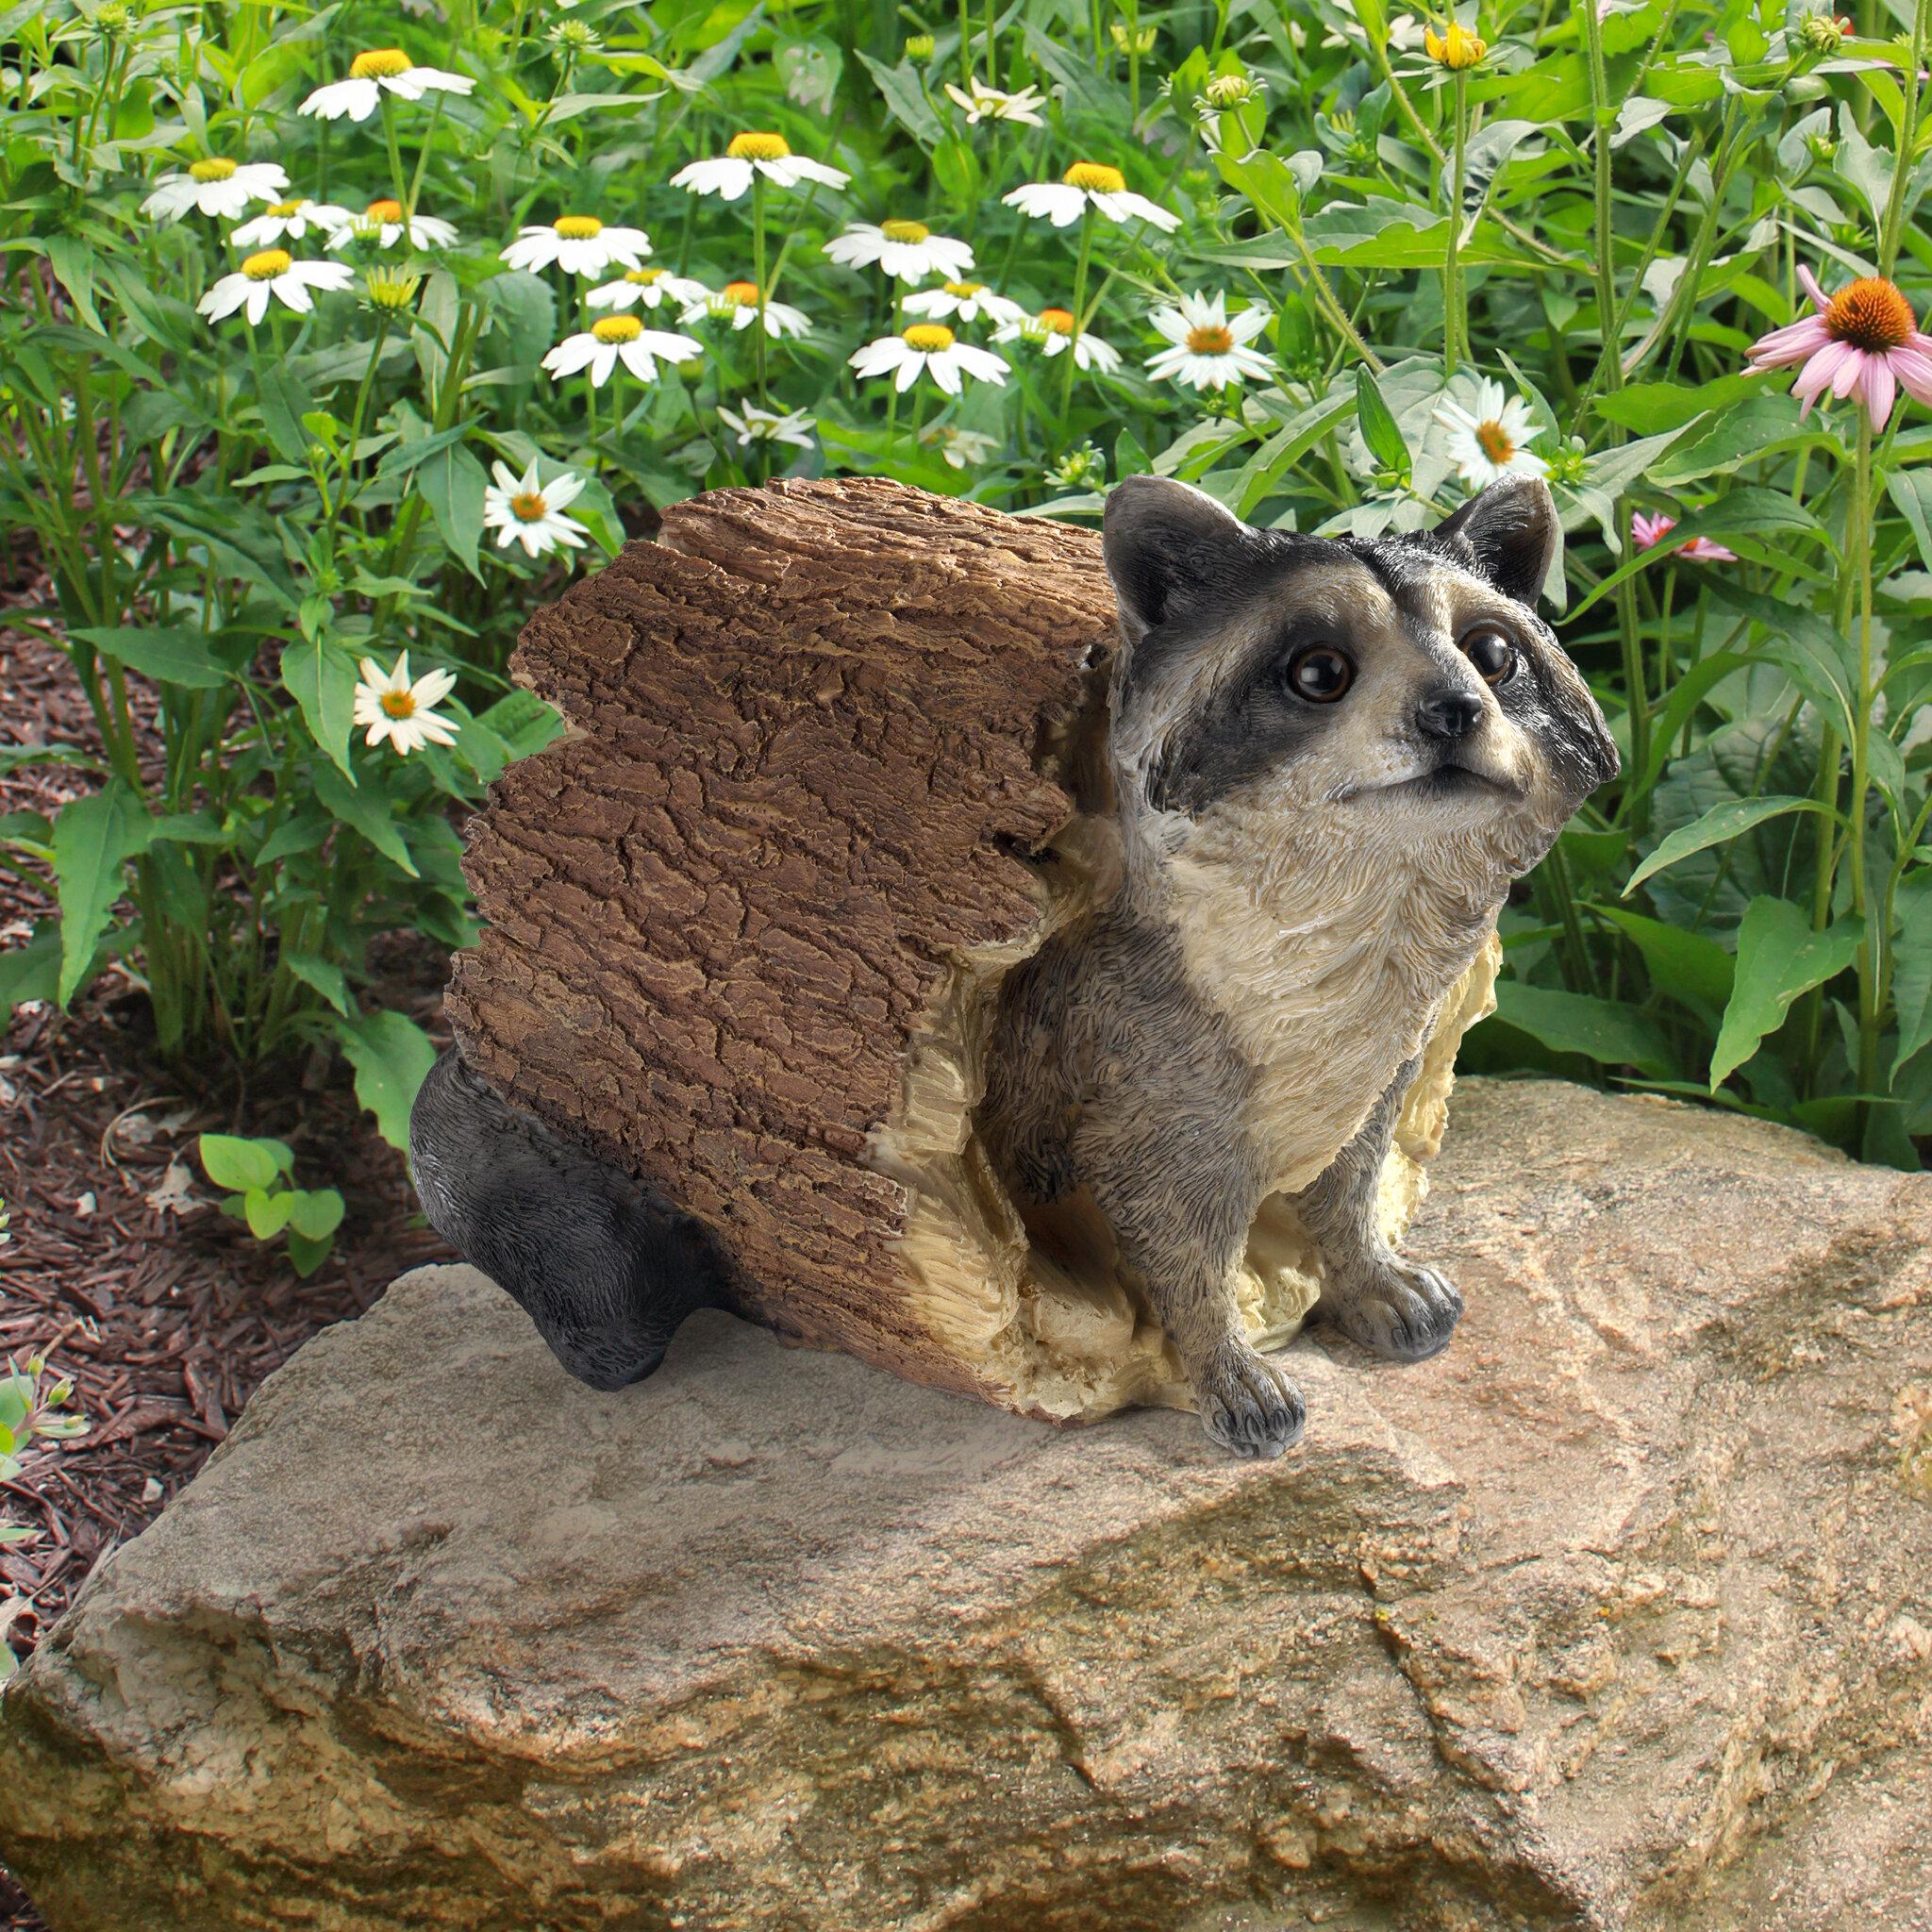 Design Toscano Raccoon Statue & Reviews | Wayfair